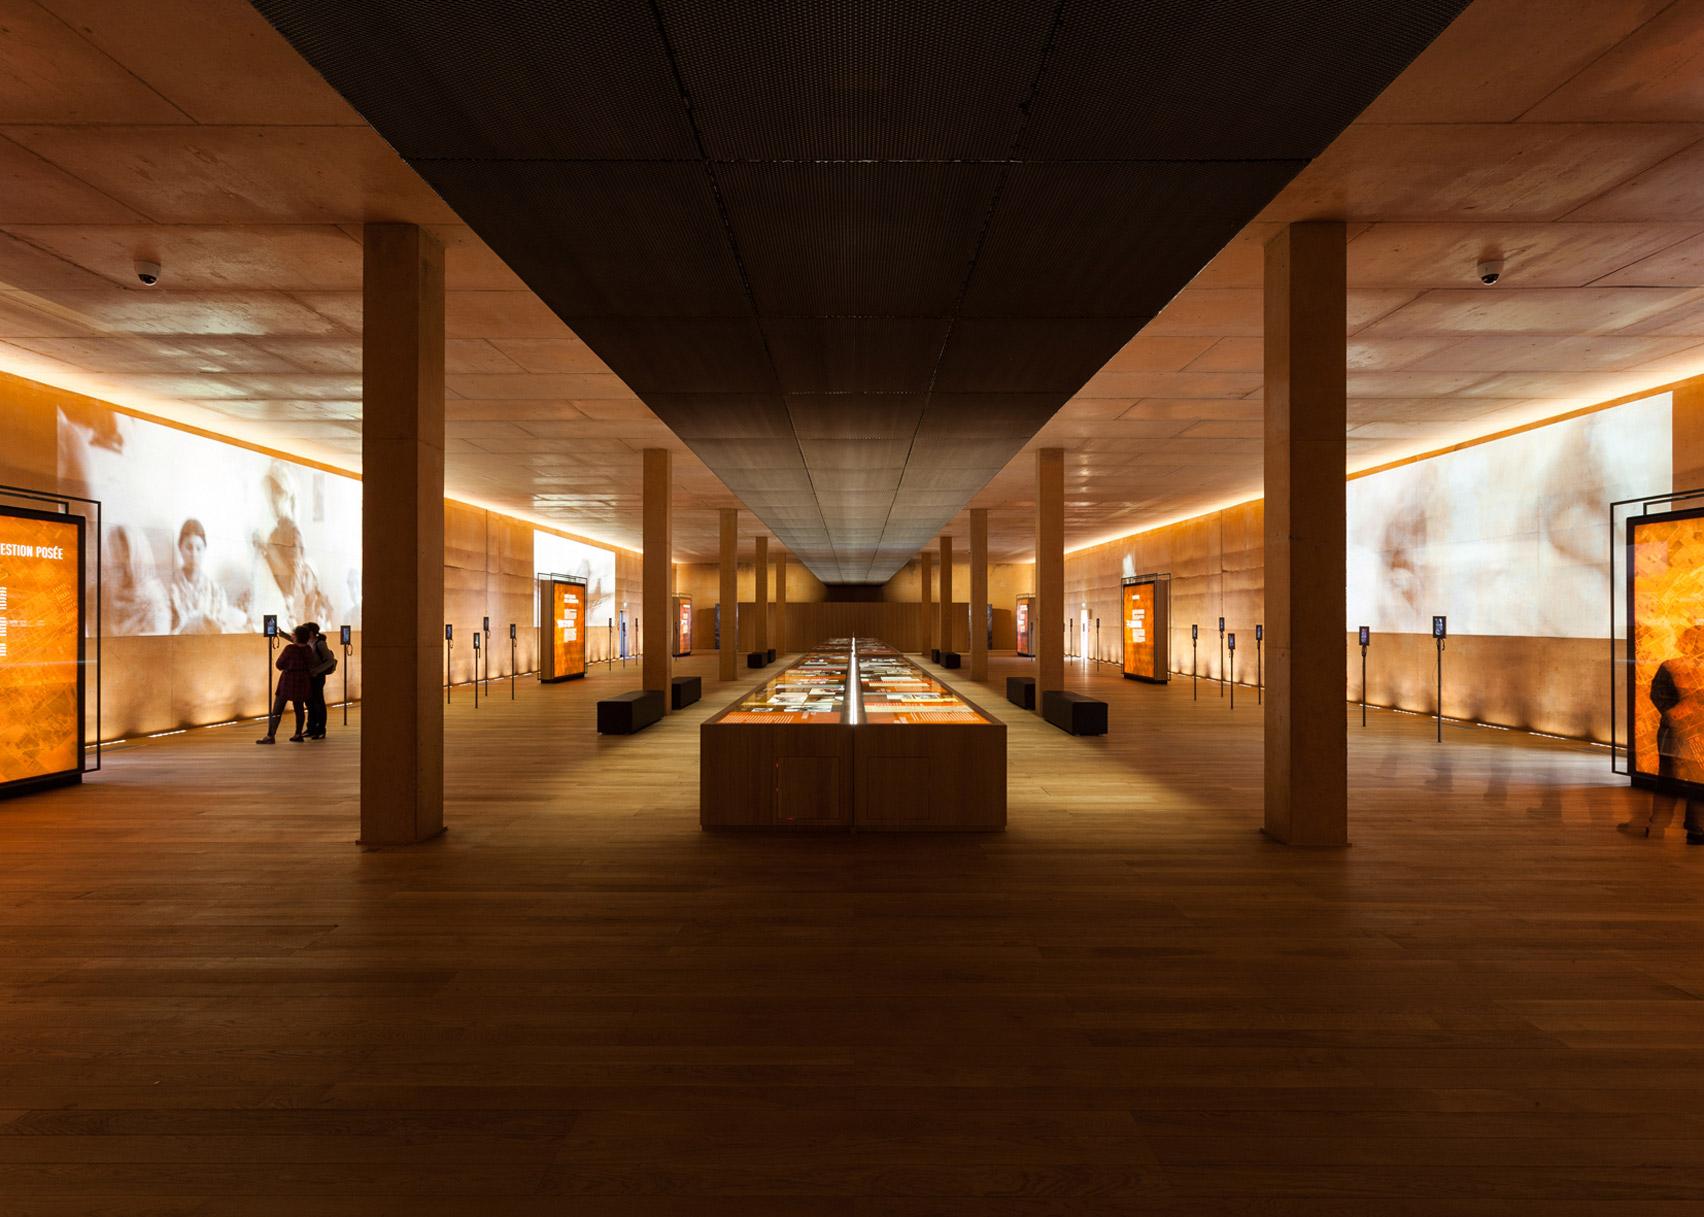 The Rivesaltes Memorial Museum, Rivesaltes/Ribesaltes, by Rudy Ricciotti